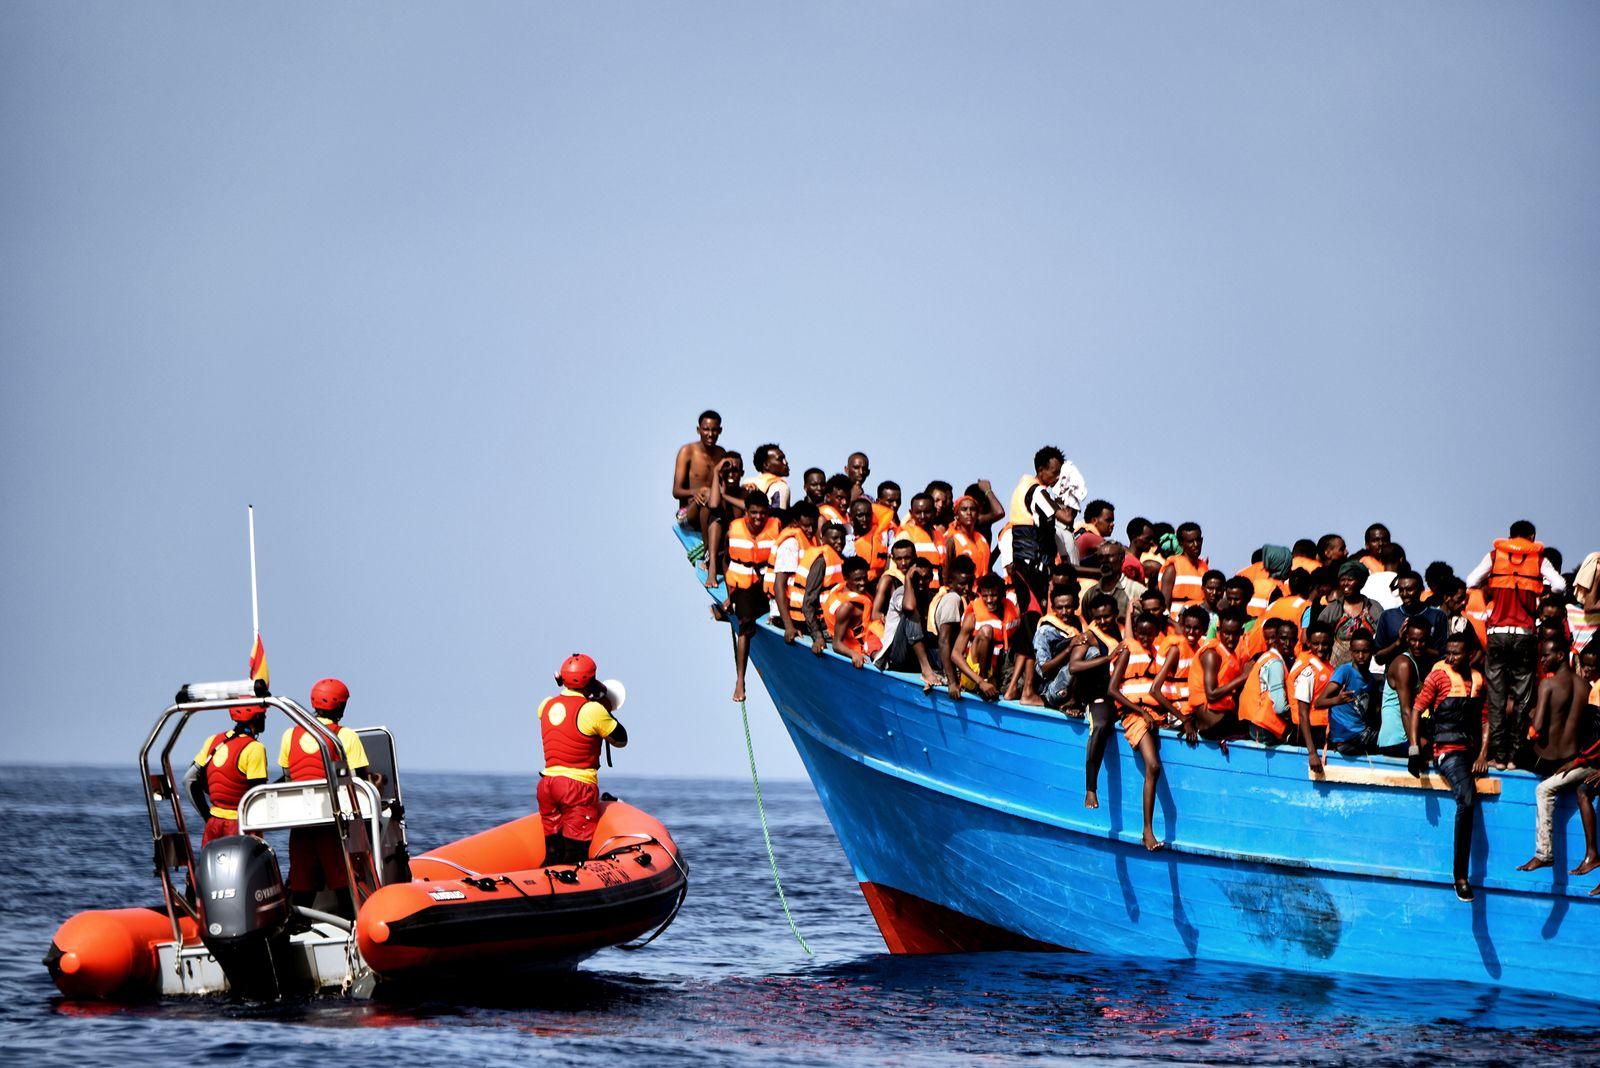 LIBYA-SPAIN-EUROPE-MIGRANTS-NGO-RESCUE